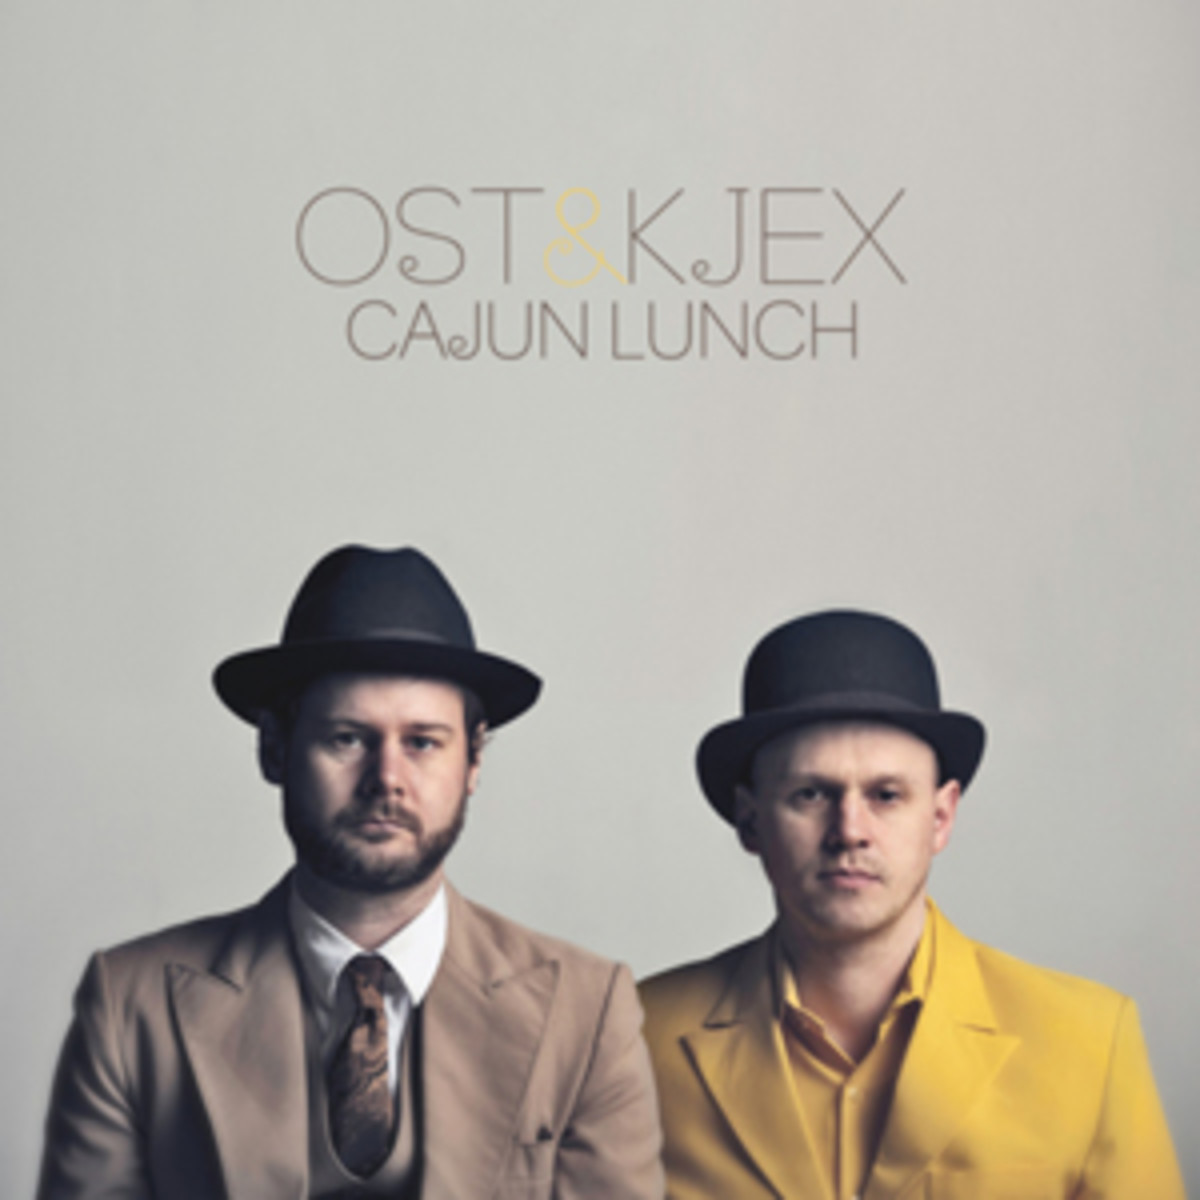 Ost & Kjex - Cajun Lunch